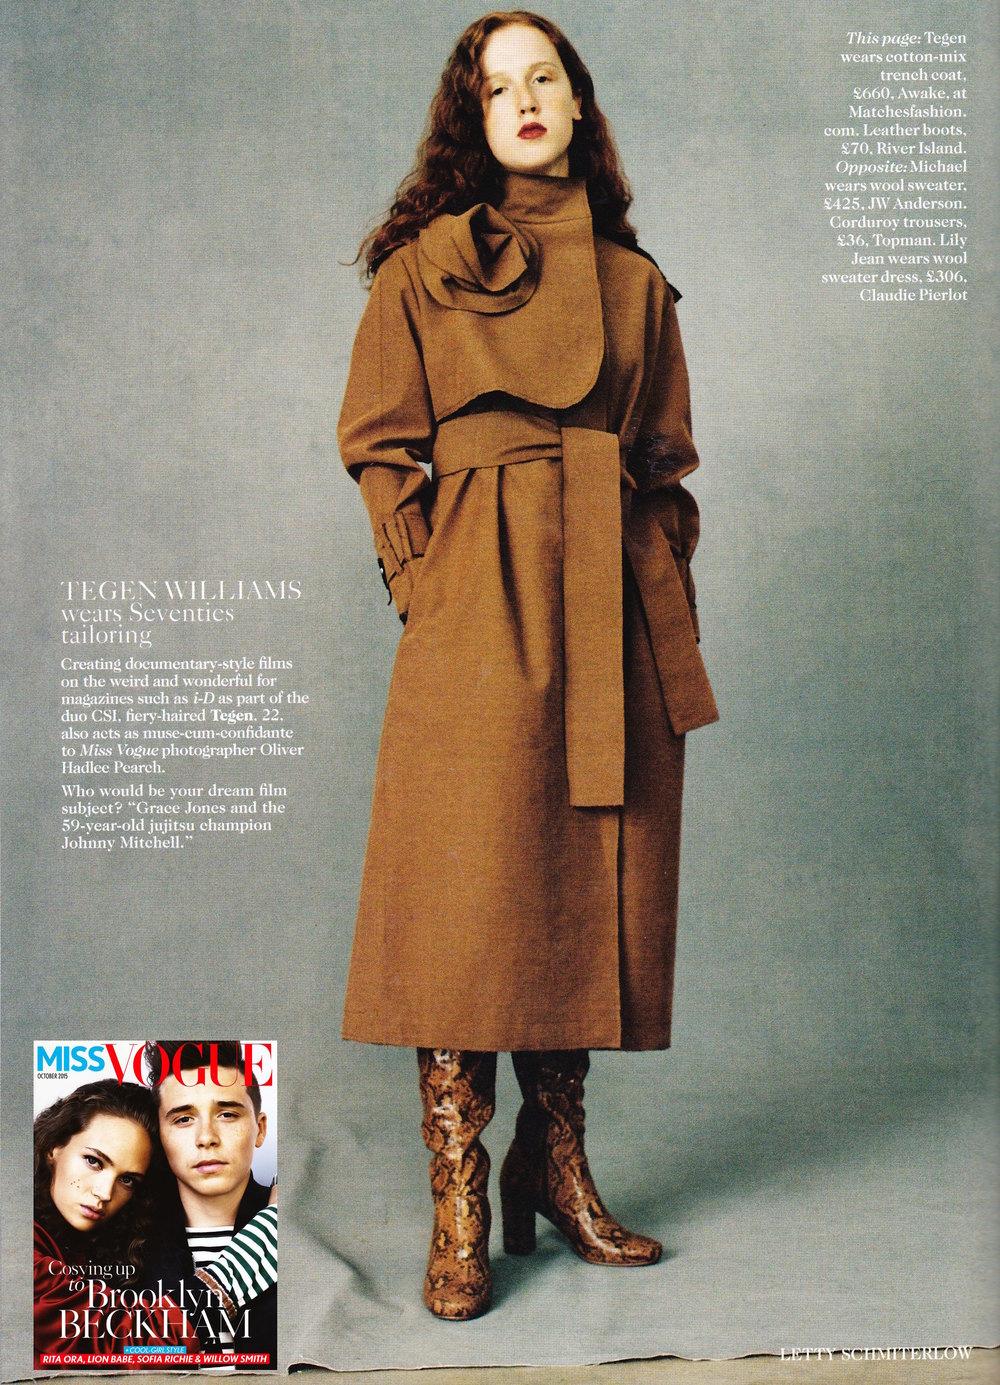 Vogue UK Miss Vogue Oct15 page90.jpg